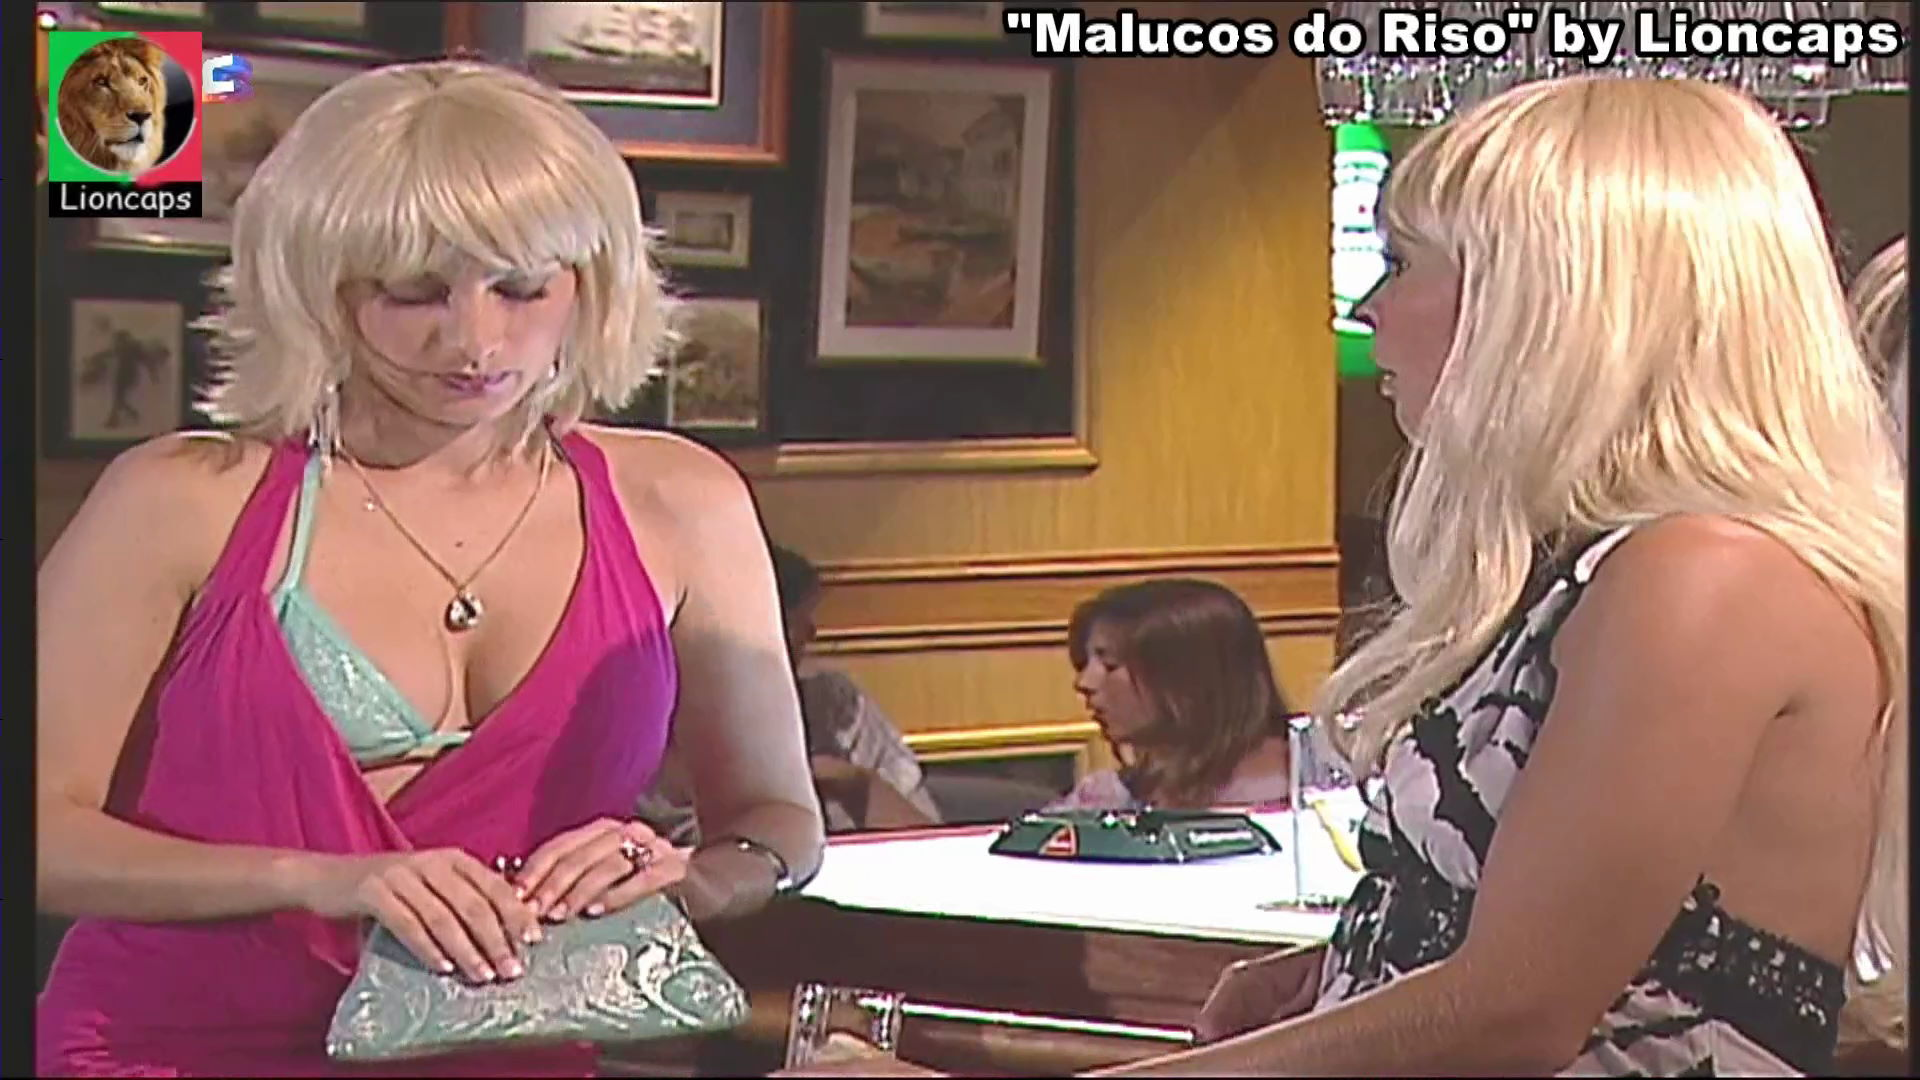 475055262_malucos_riso_alda_gomes_vs190malucos_riso_602_1502_122_474lo.JPG